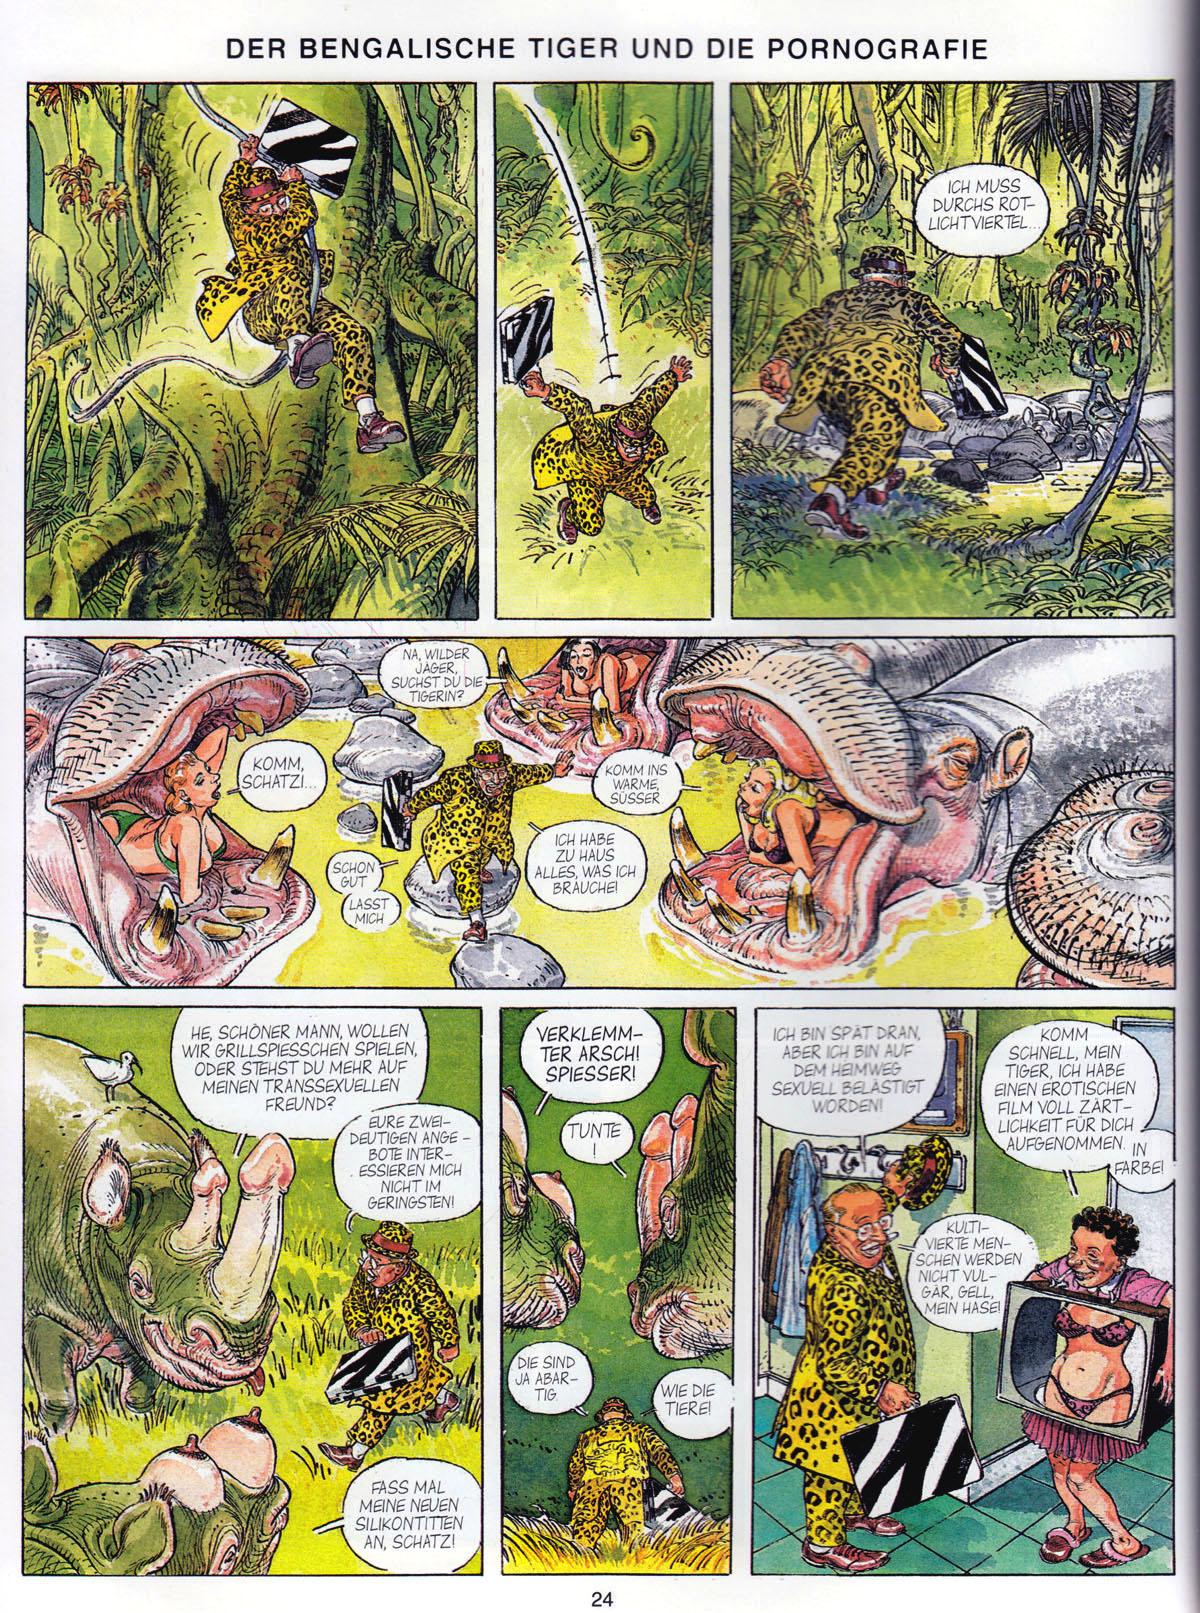 E Fachmagazin Fur Comic Kultur Bildgeschichte Unabhangig